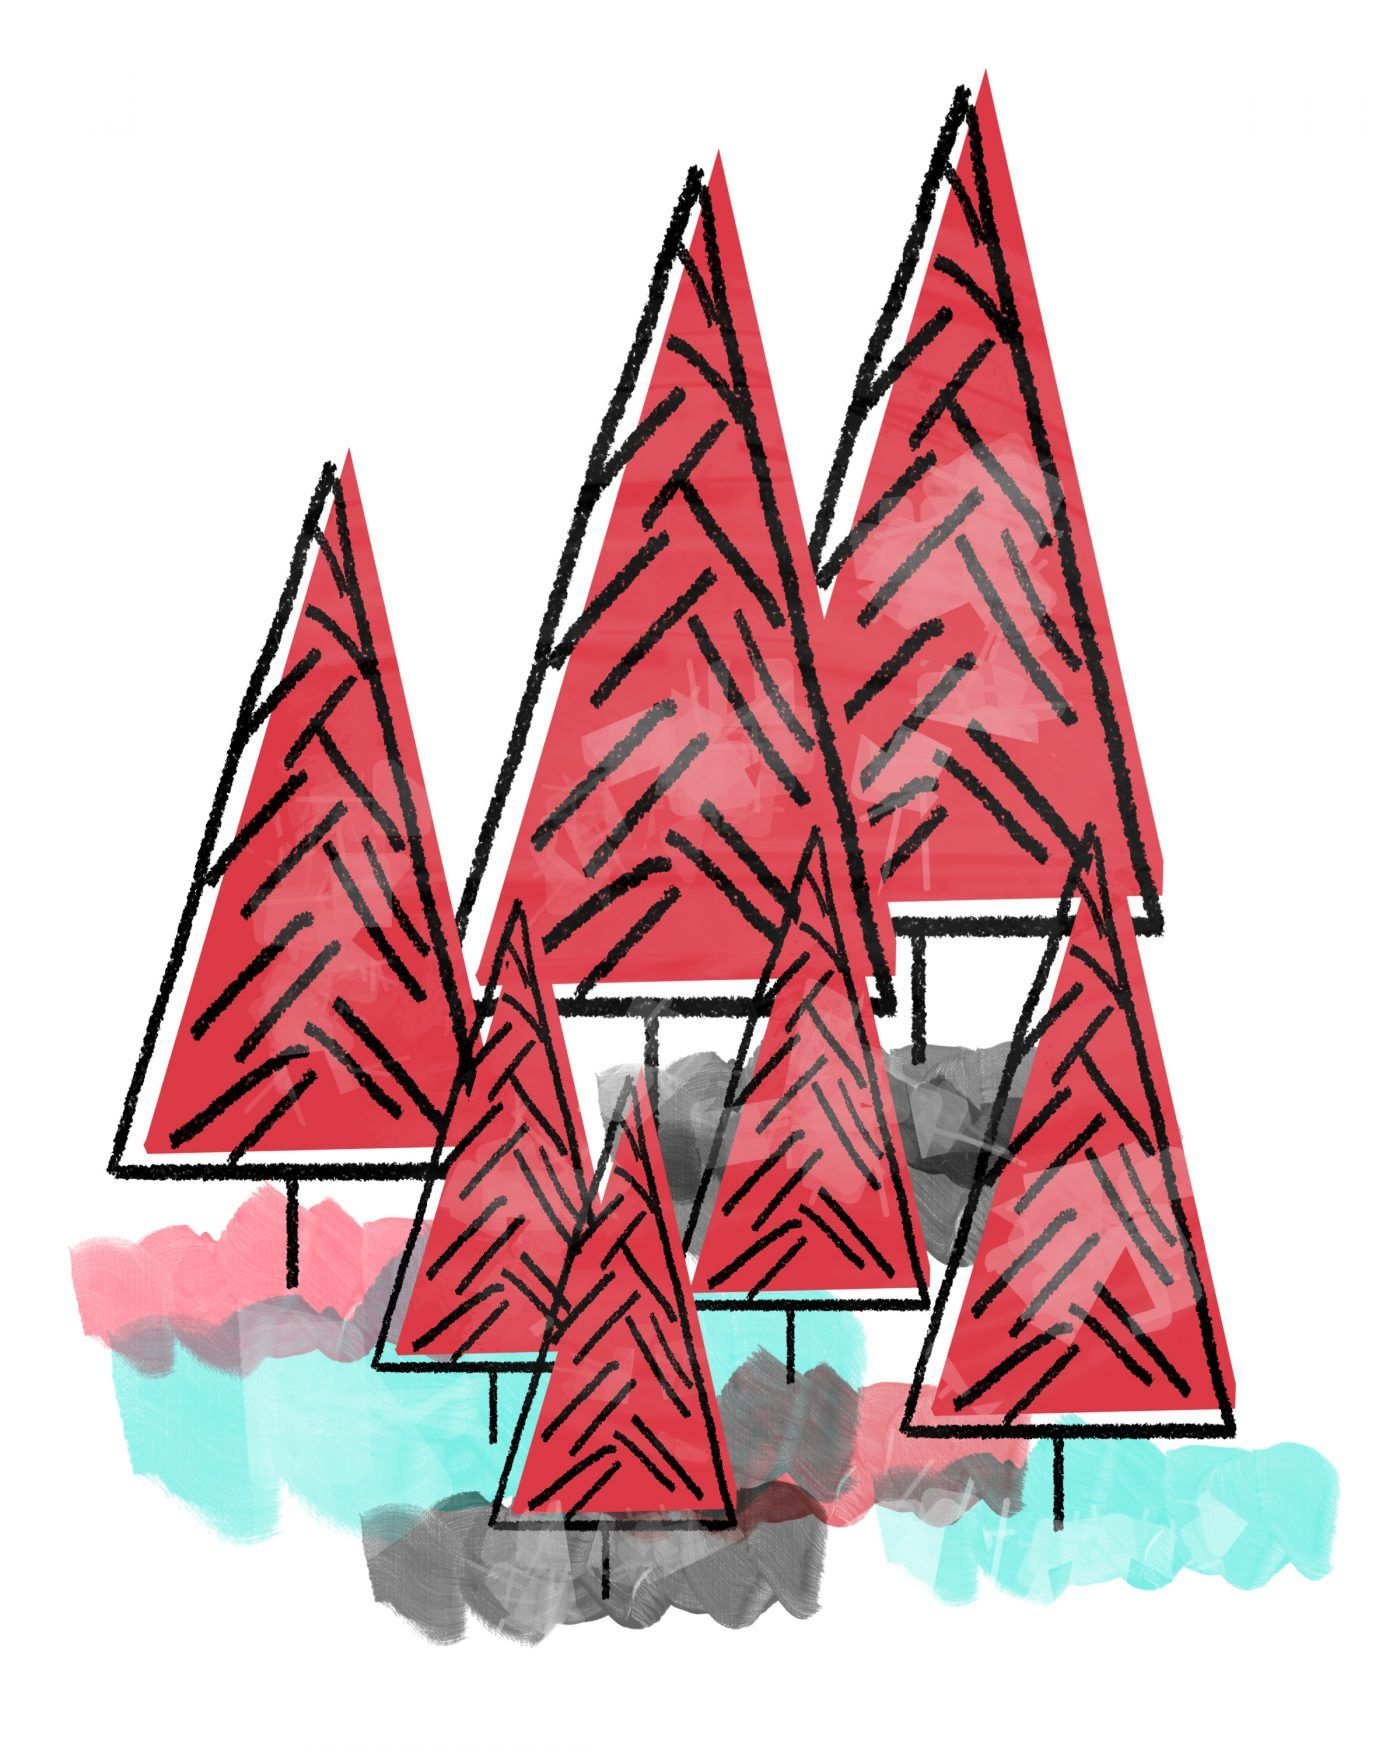 redtreesnuwhite.jpg (1400×1750) | Dibujos | Pinterest | Dibujo